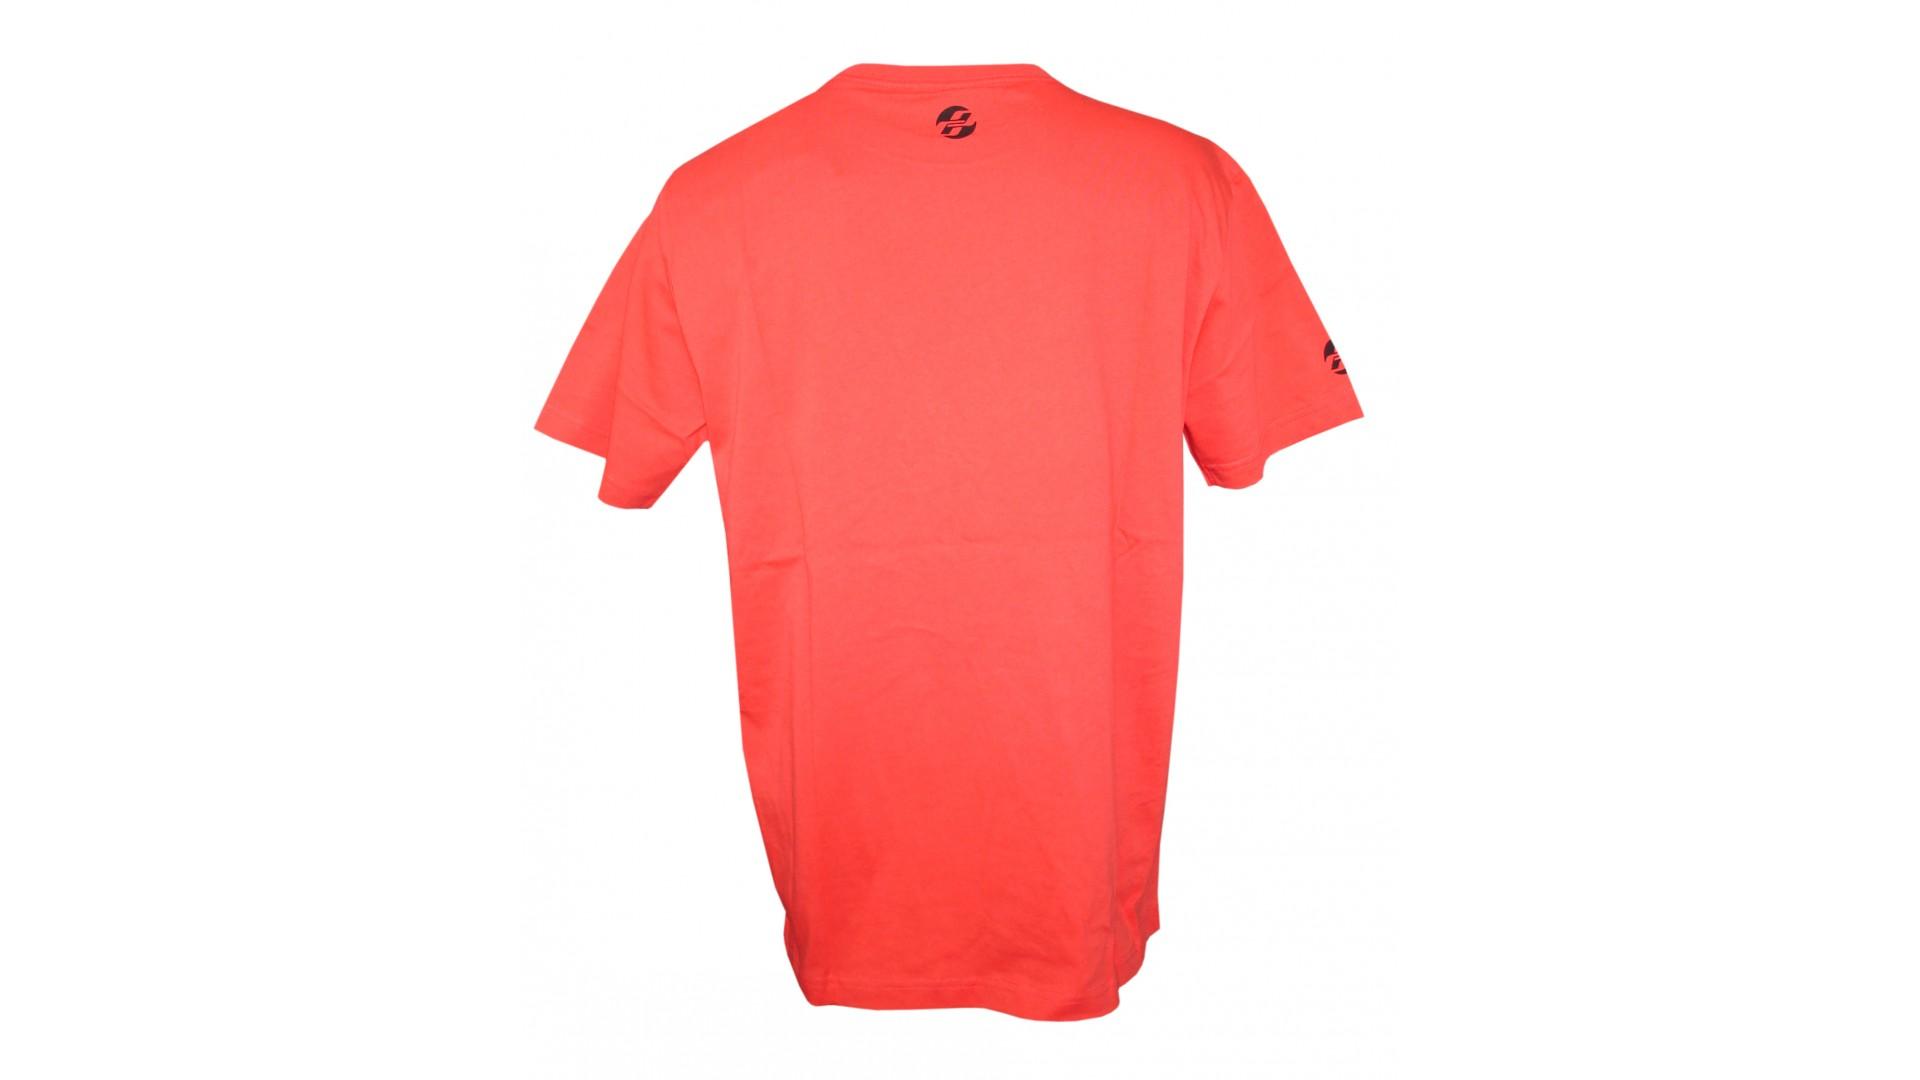 Футболка Ghost T-shirt RIOT red год 2016 вид сбоку